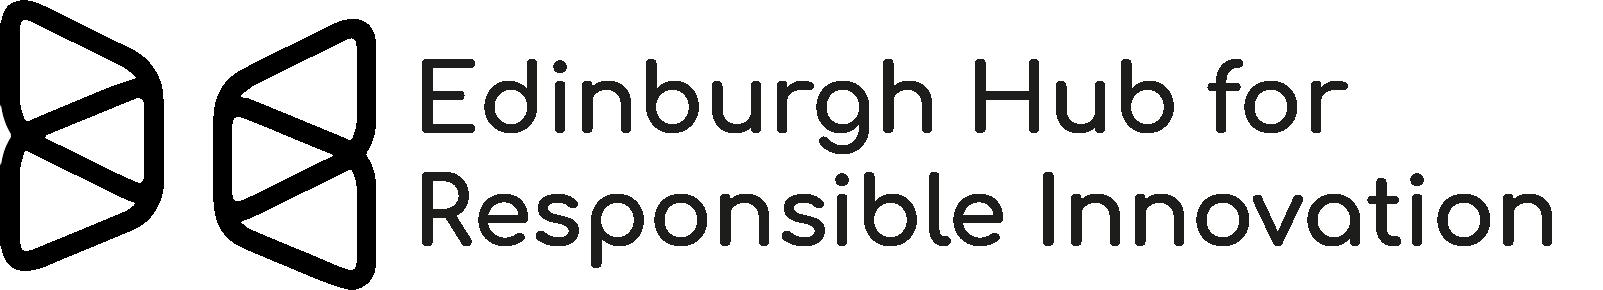 Edinburgh Hub for Responsible Innovation